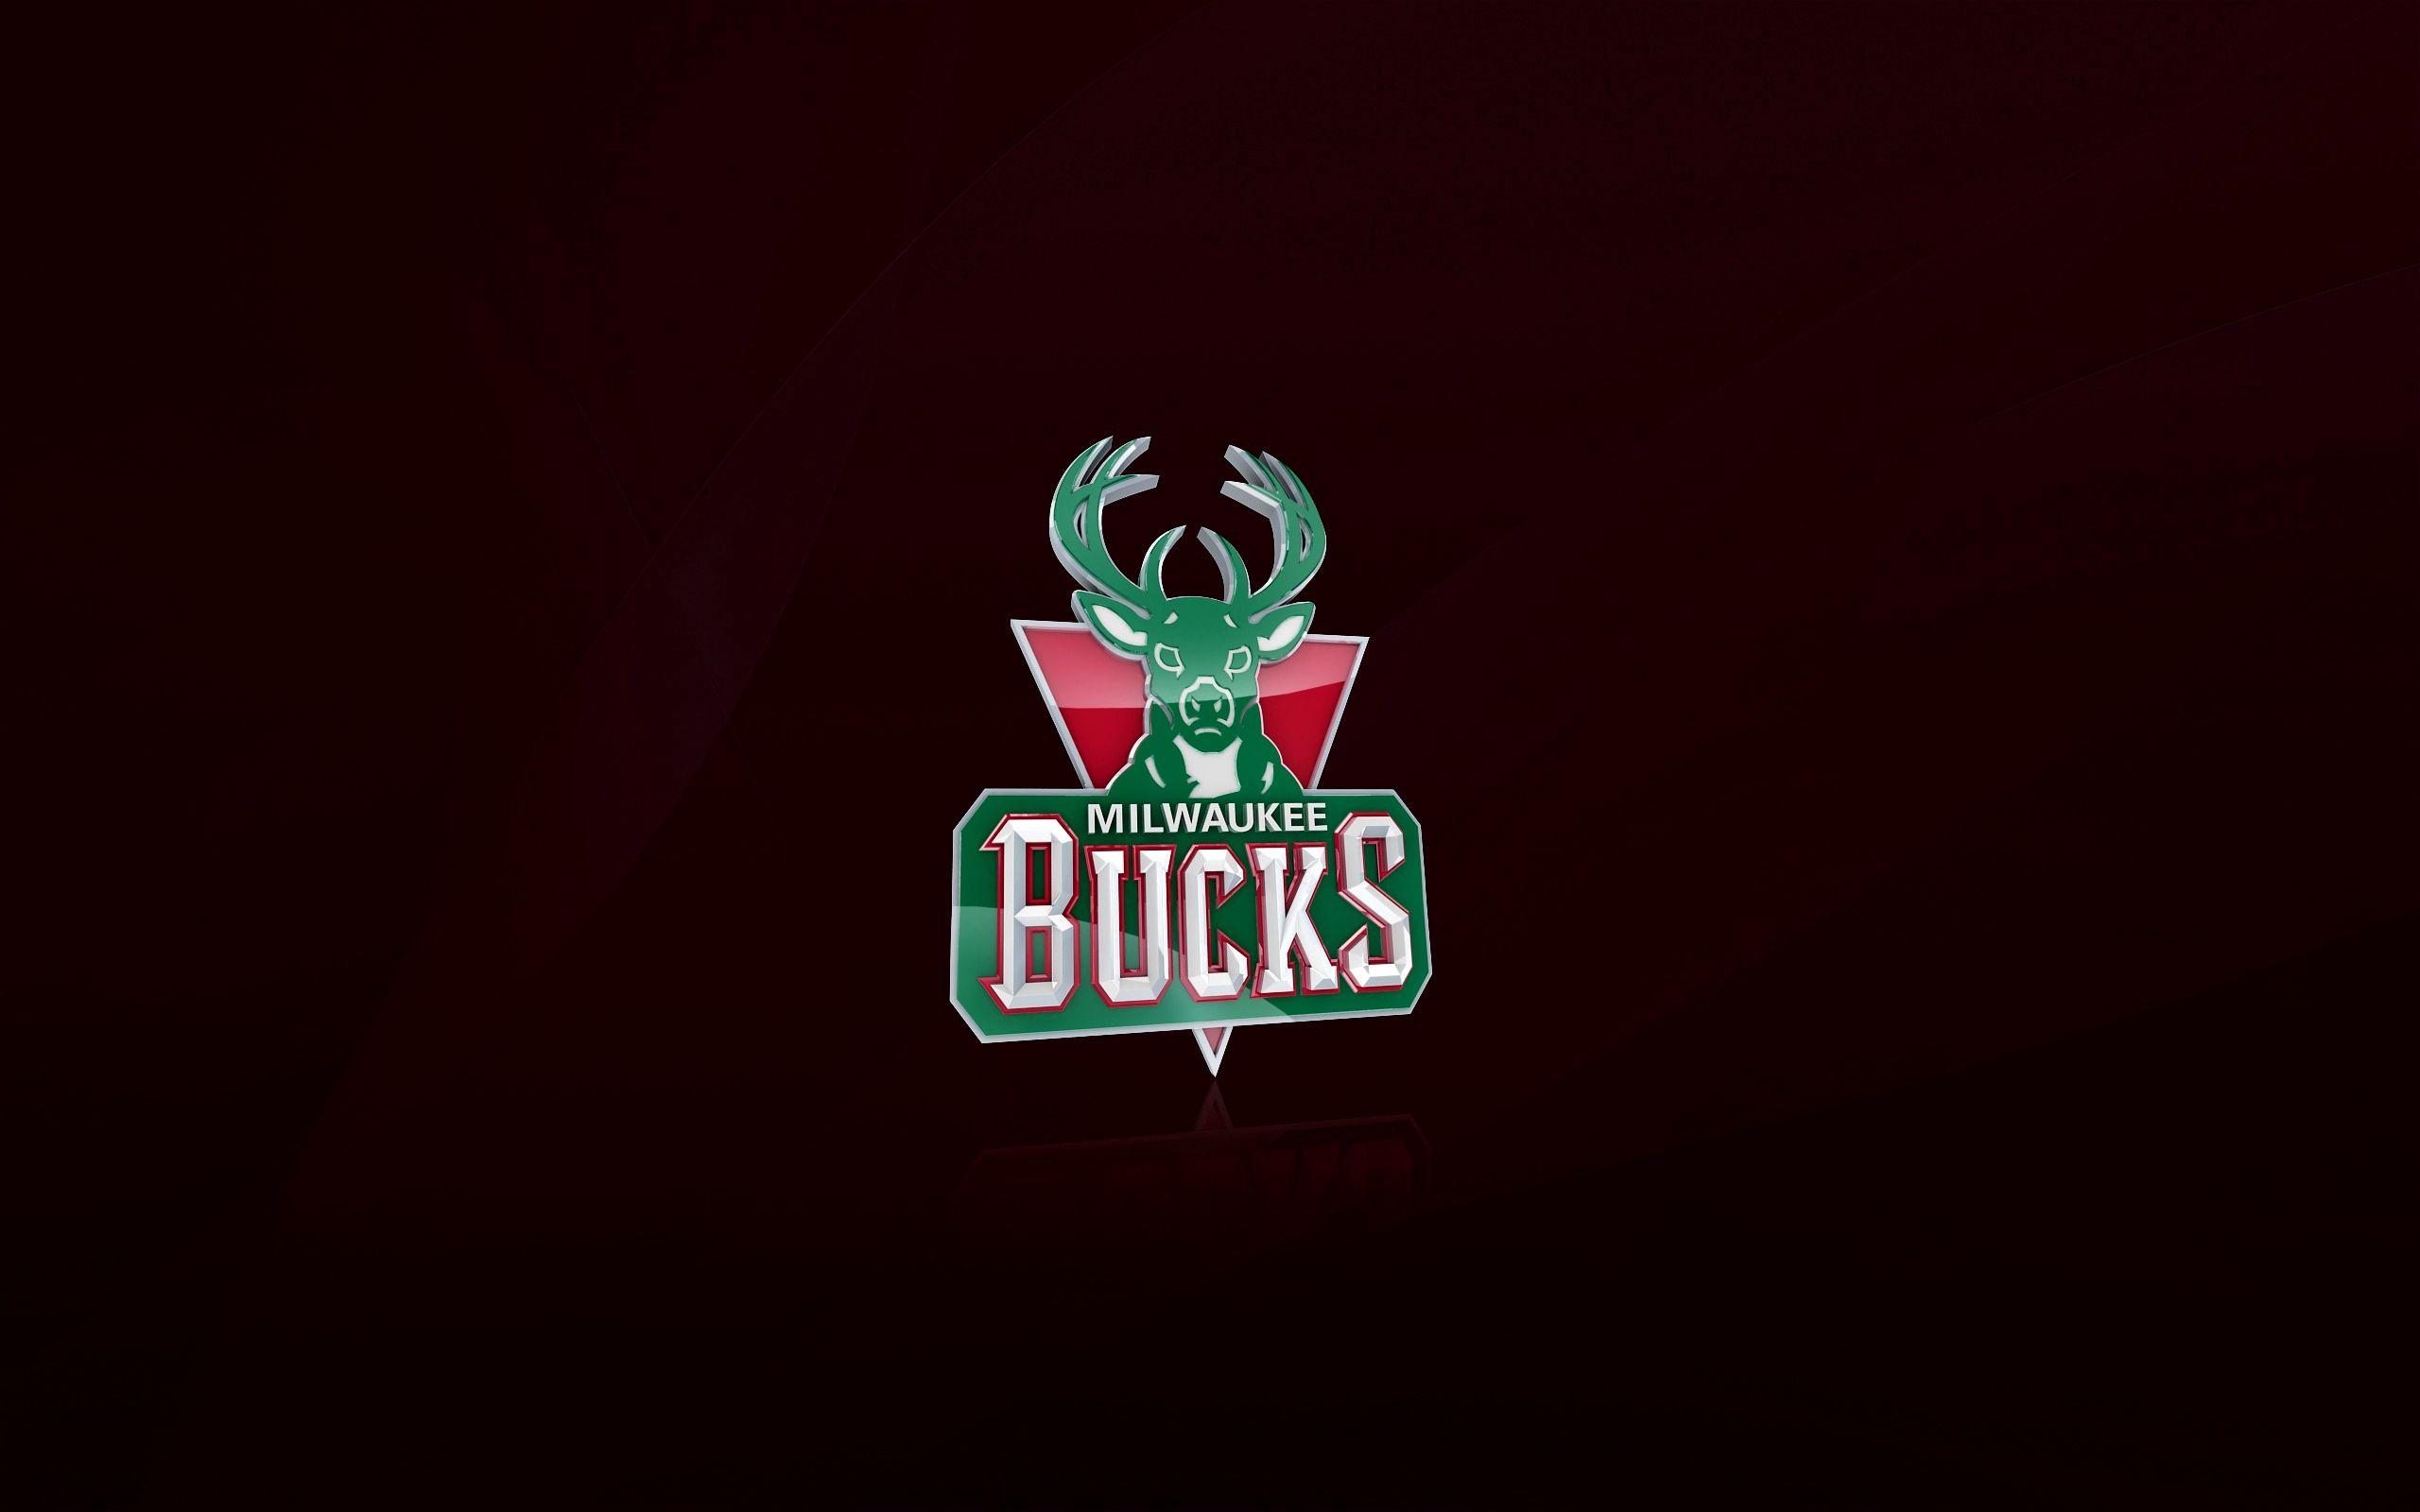 132361 скачать обои Спорт, Milwaukee Bucks, Нба, Баскетбол, Логотип - заставки и картинки бесплатно